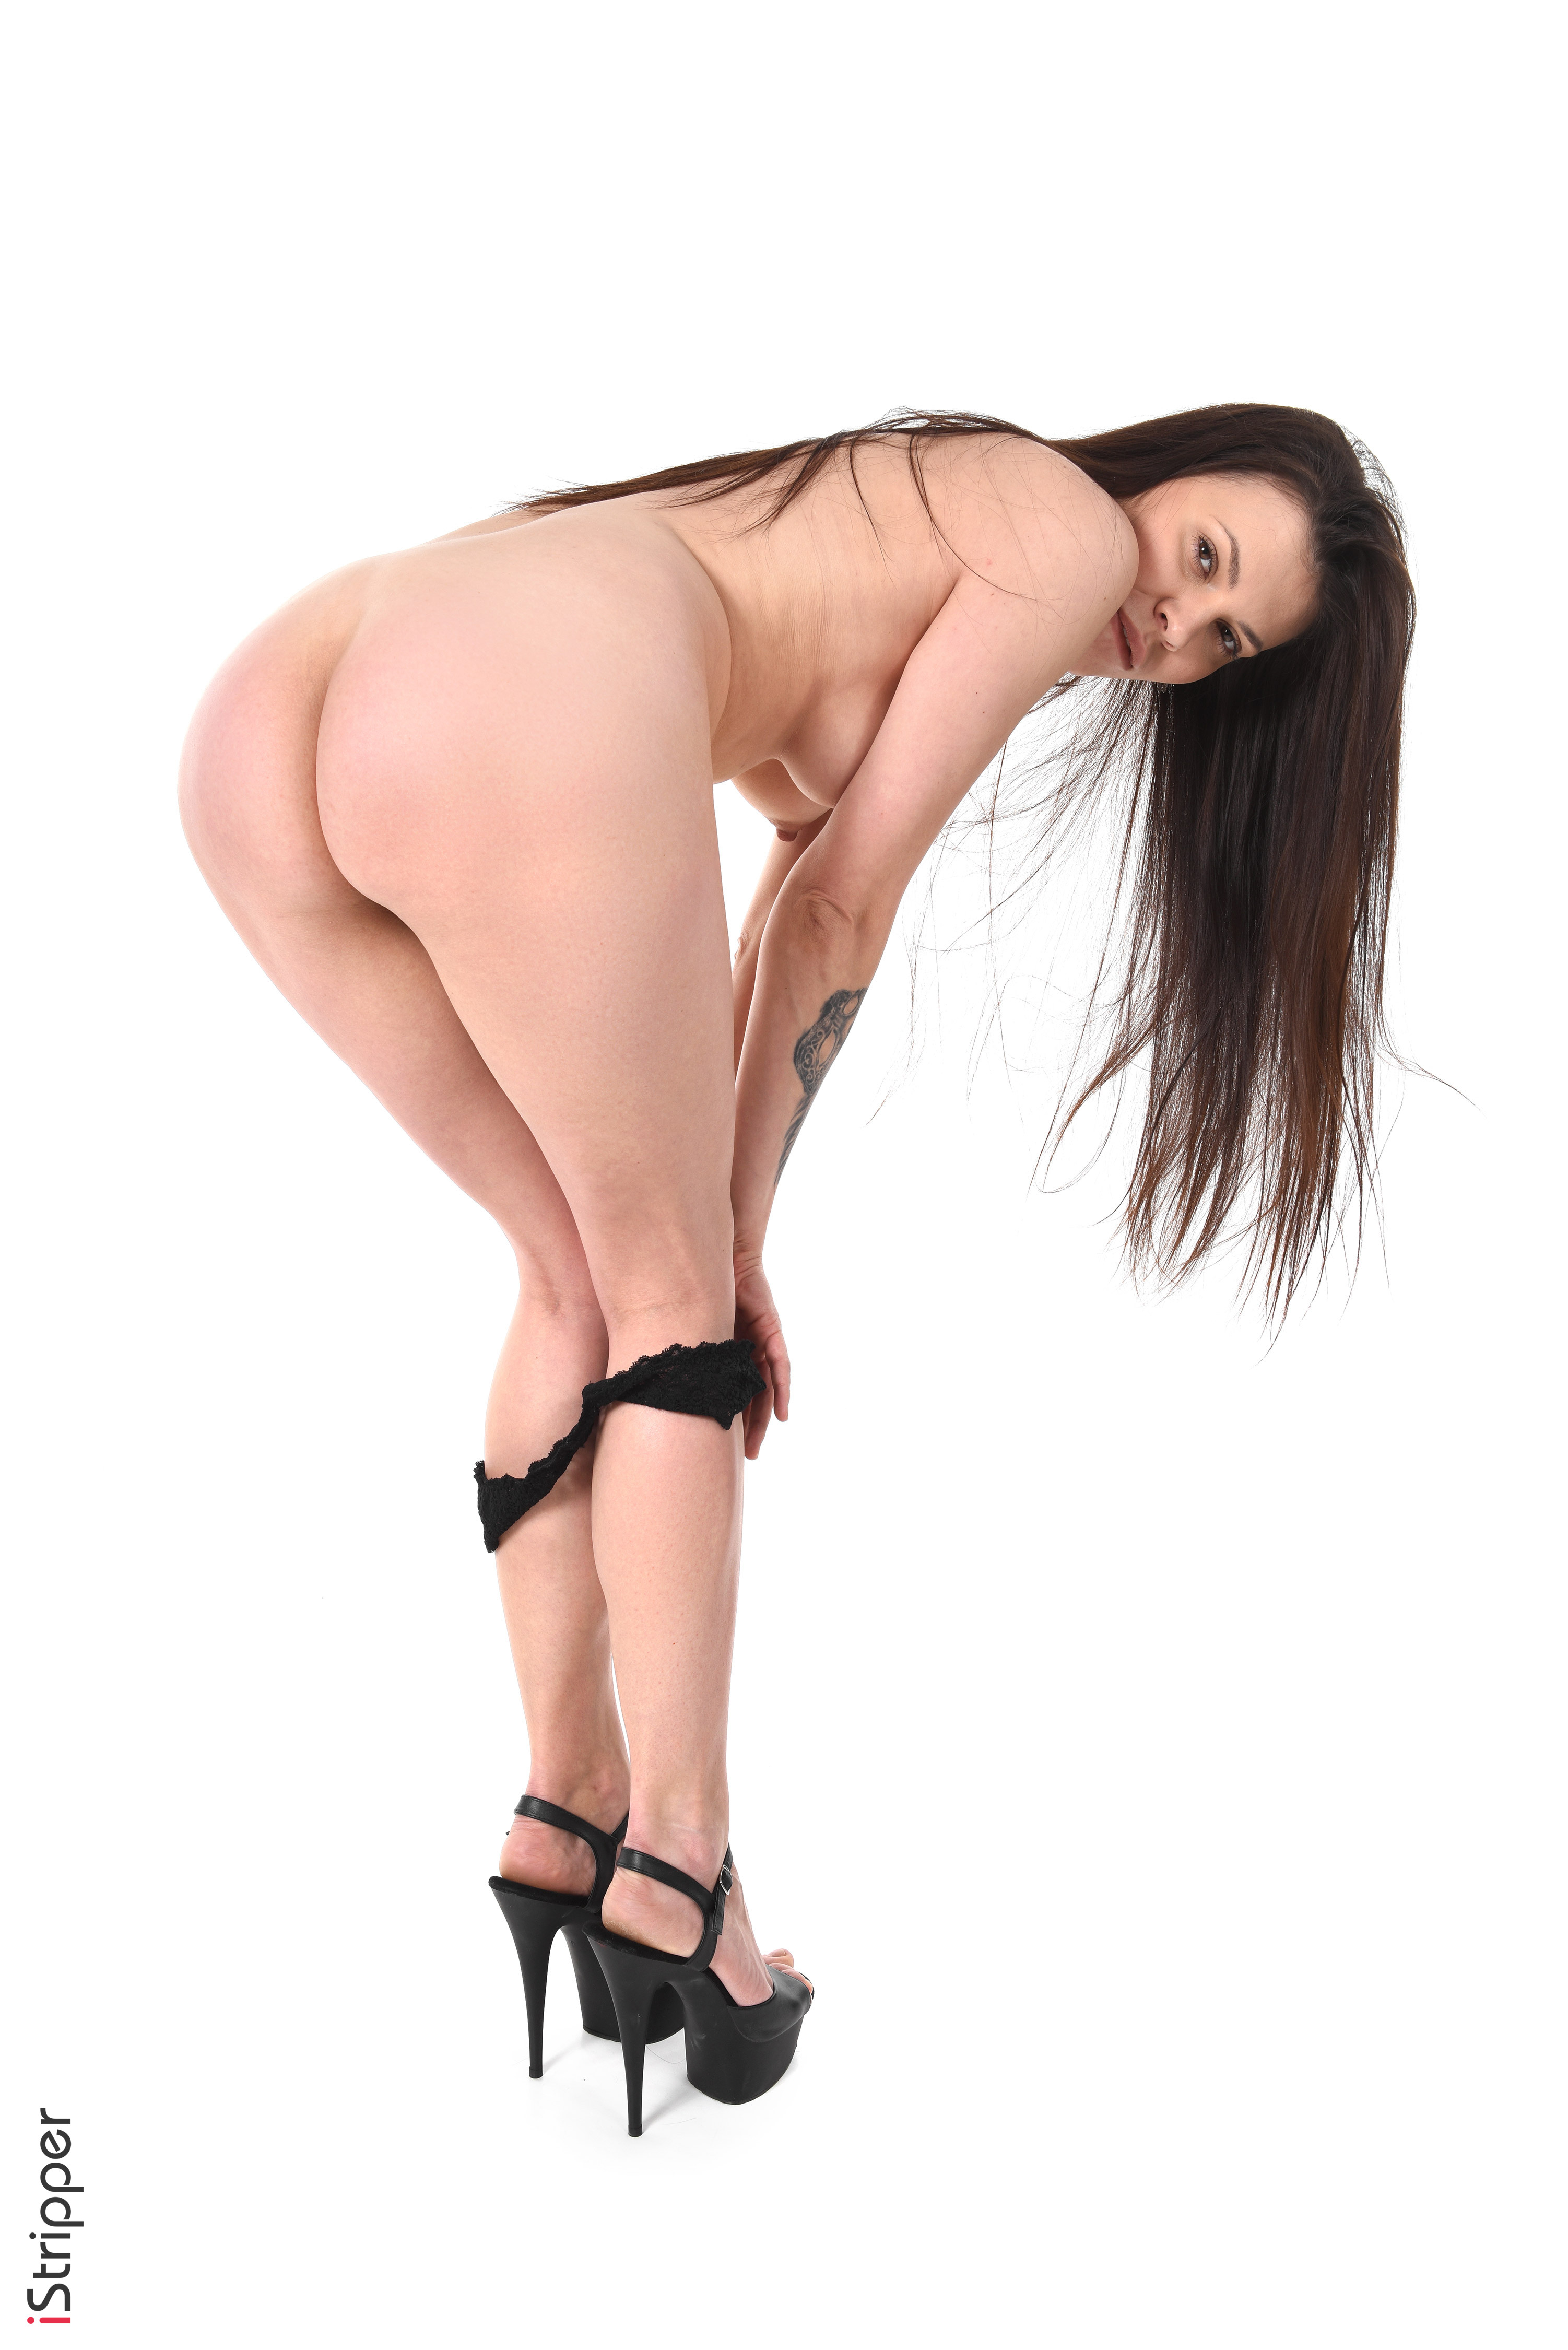 sexy striptease 18yr corset white